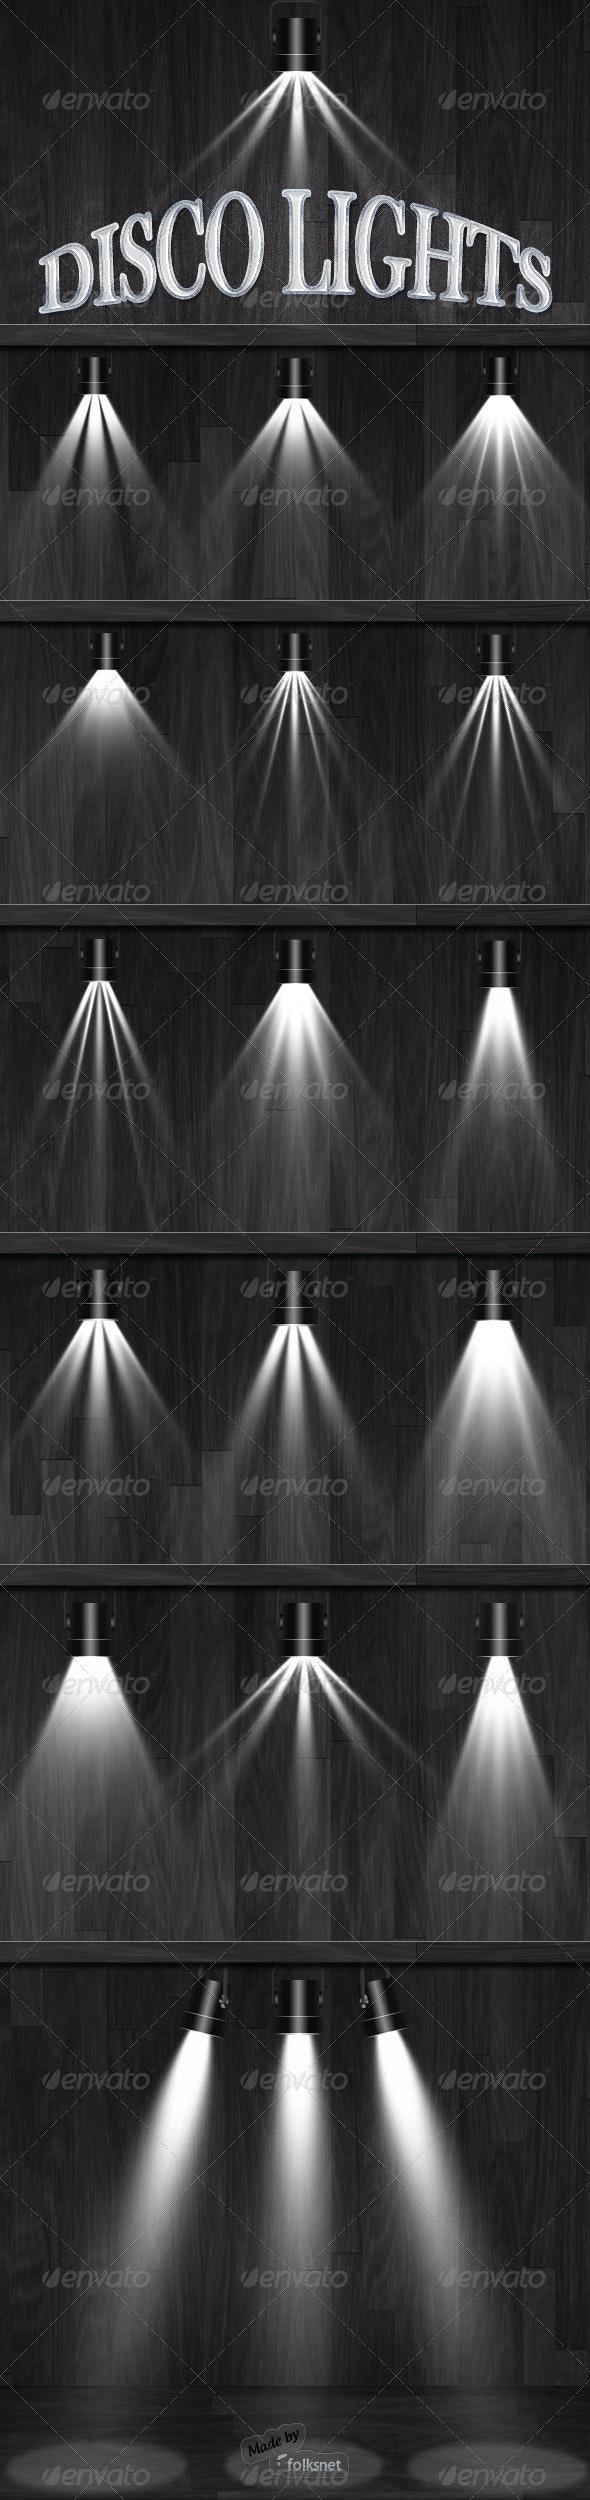 Disco Lights - Miscellaneous Graphics